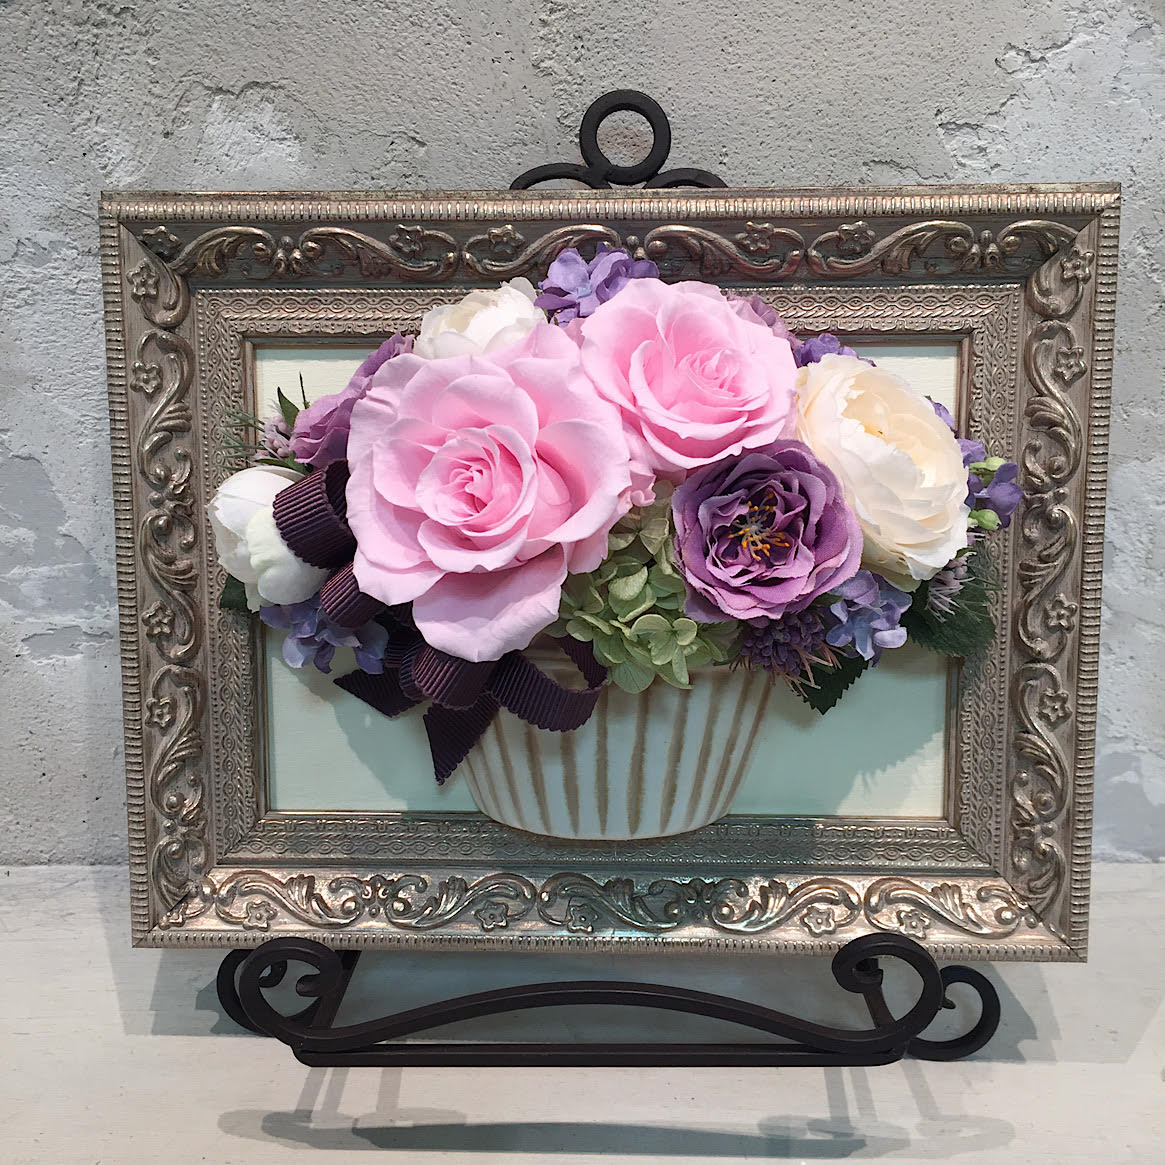 【T様専用オーダー商品】花絵 ピンクと紫のバラの壁掛けアレンジ